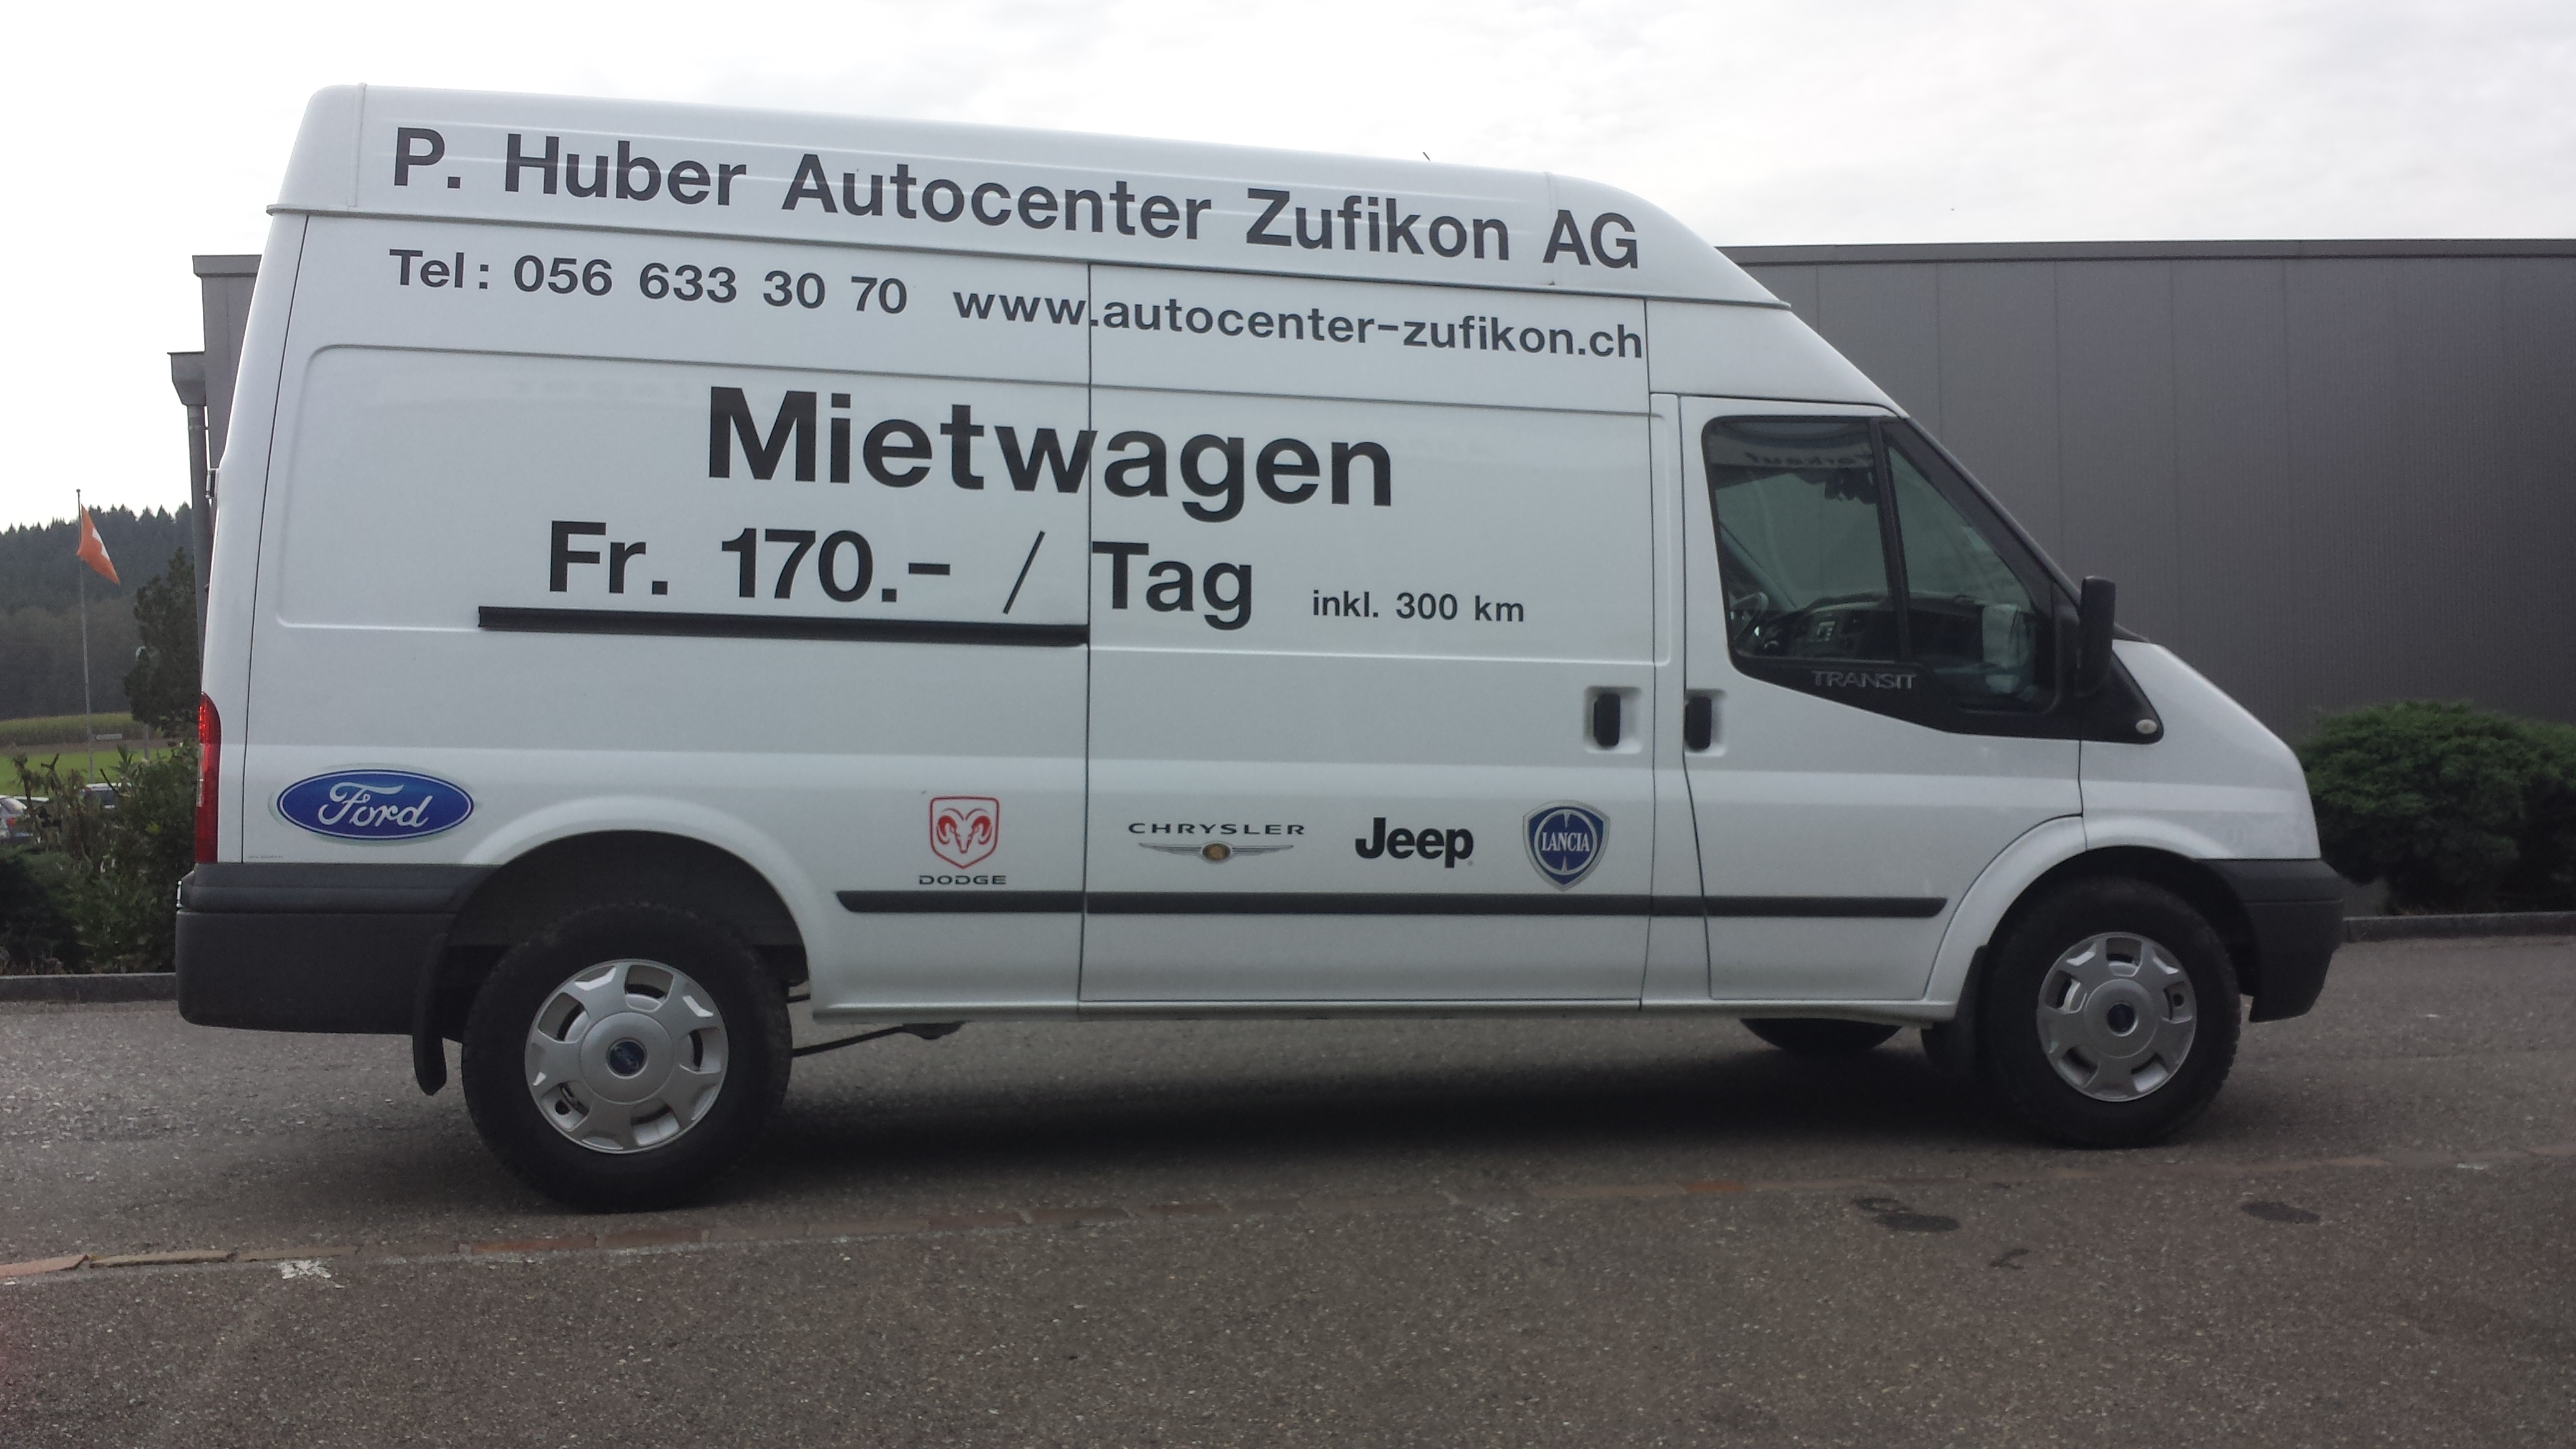 P. Huber Autocenter AG Zufikon